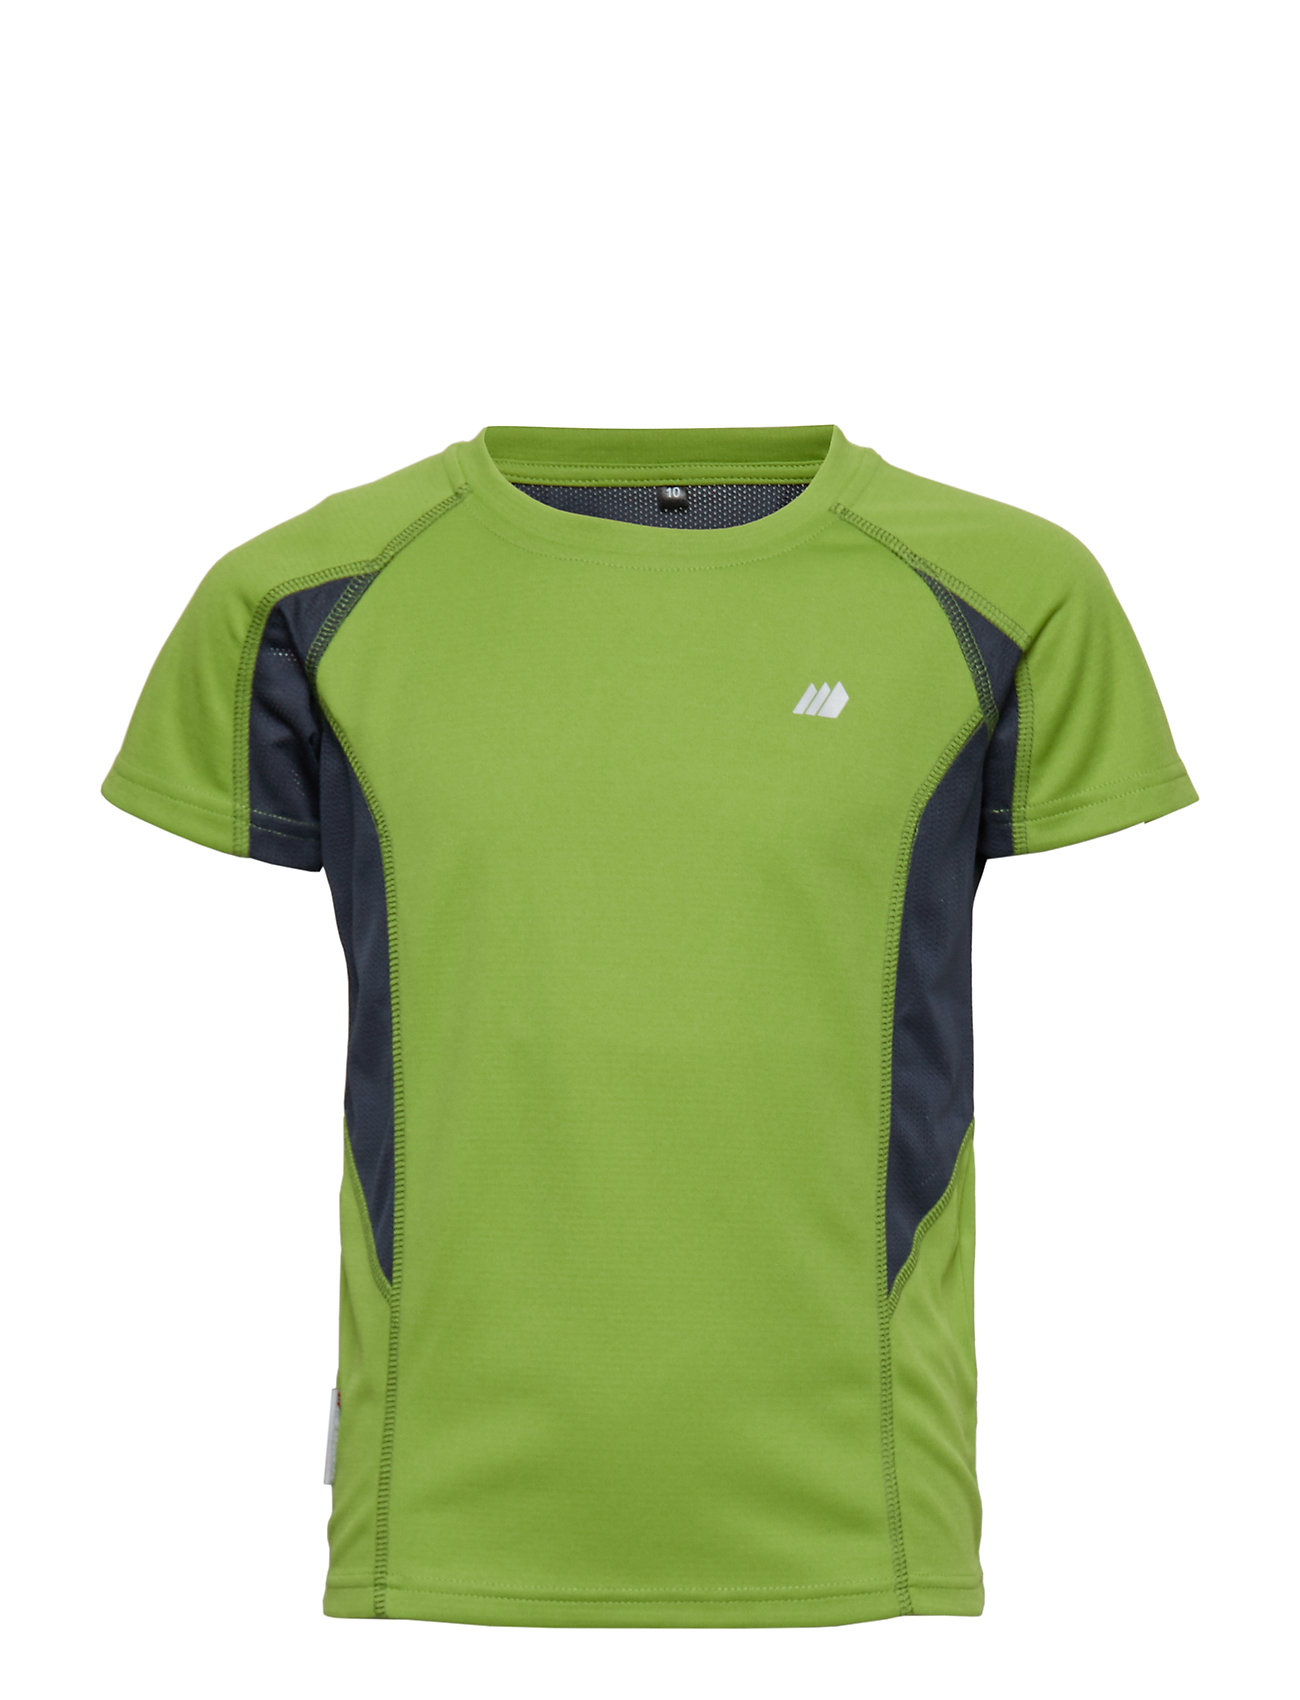 Skogstad Todal Technical T-Shirt - PERIDOT